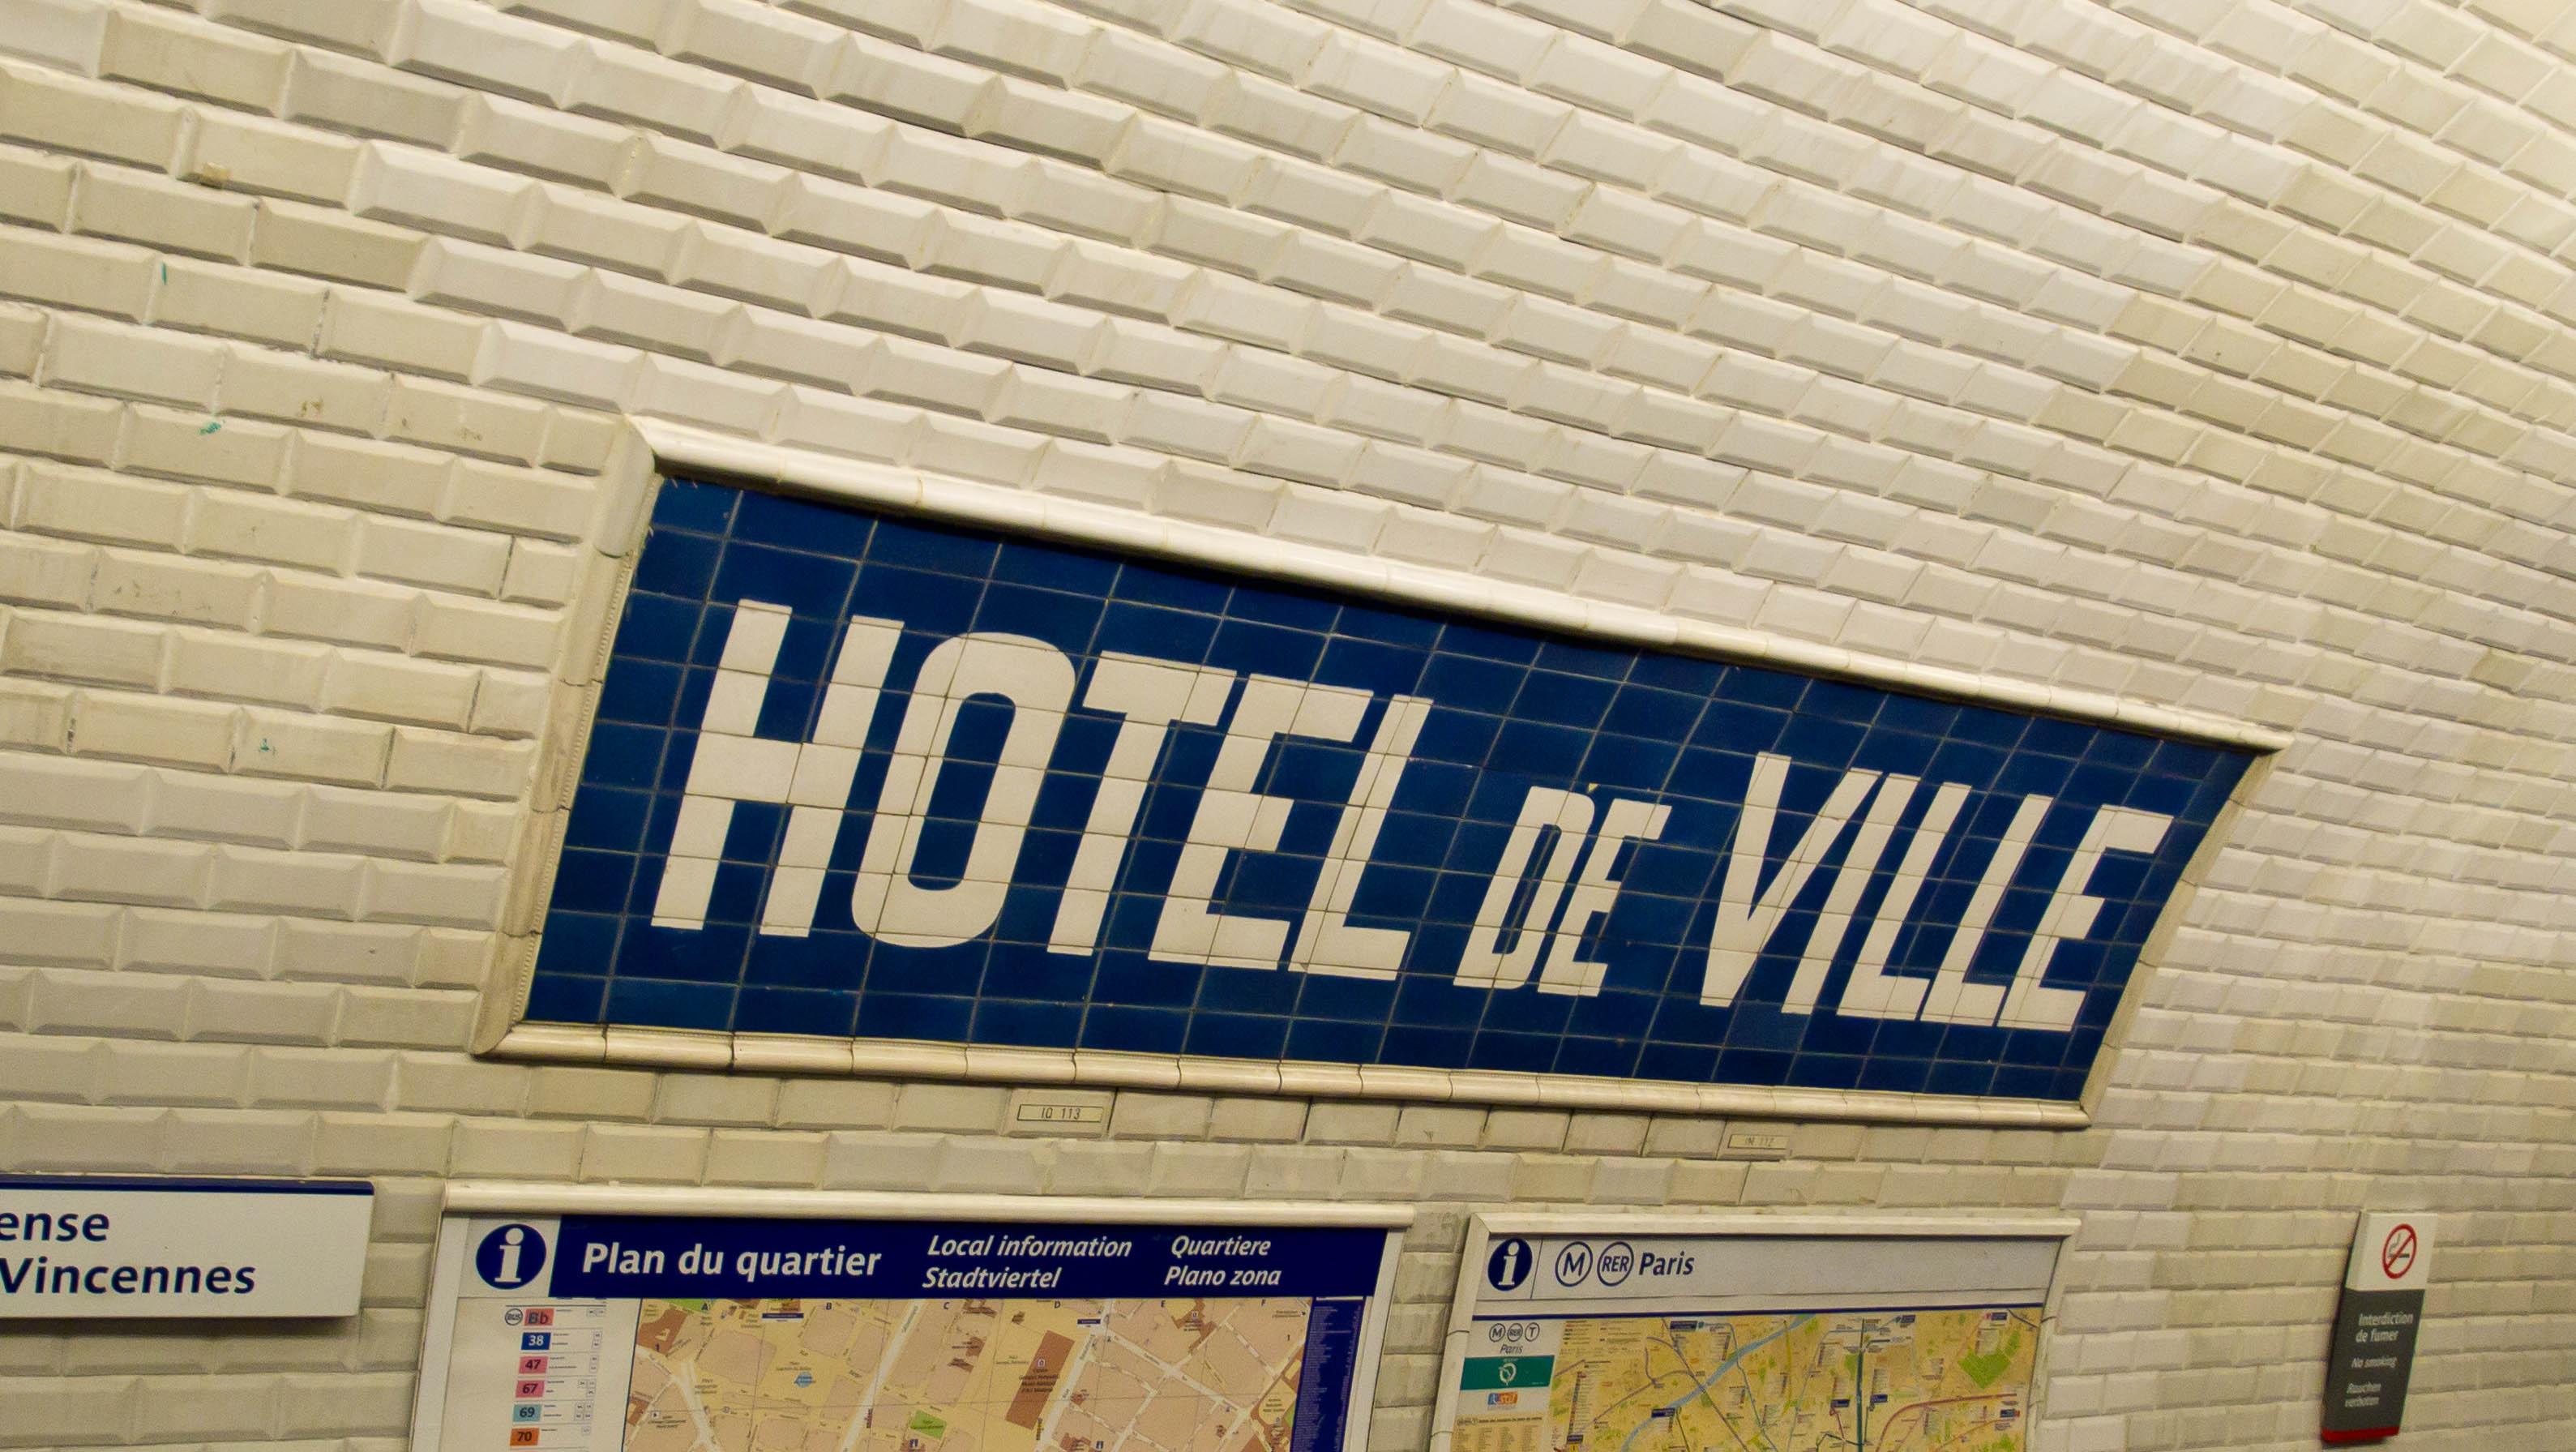 Metro Hotel De Ville Ligne